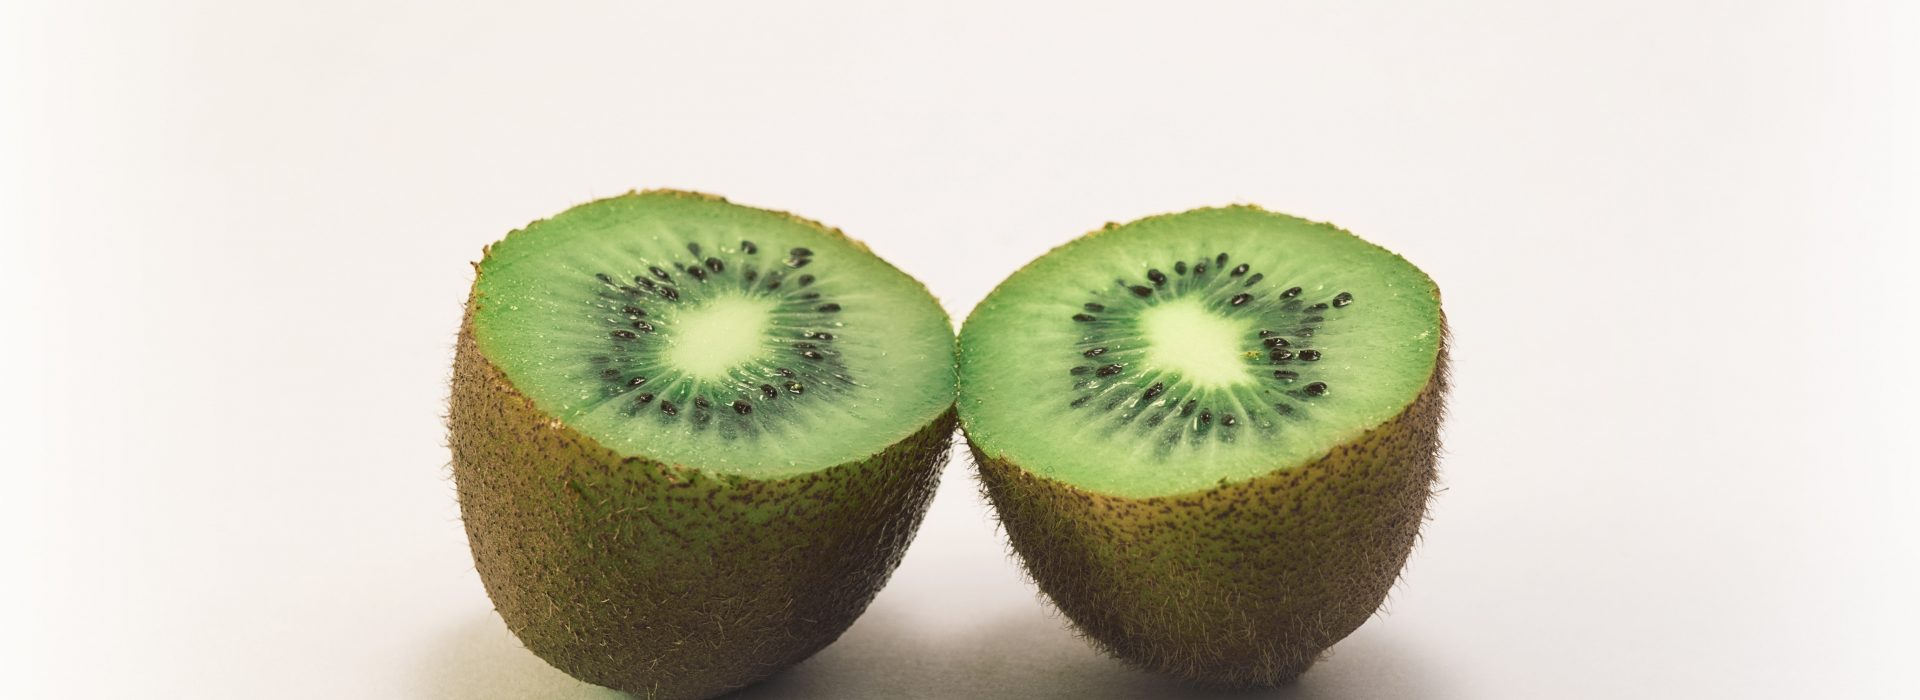 color-fruit-kiwi-vitamins-54370